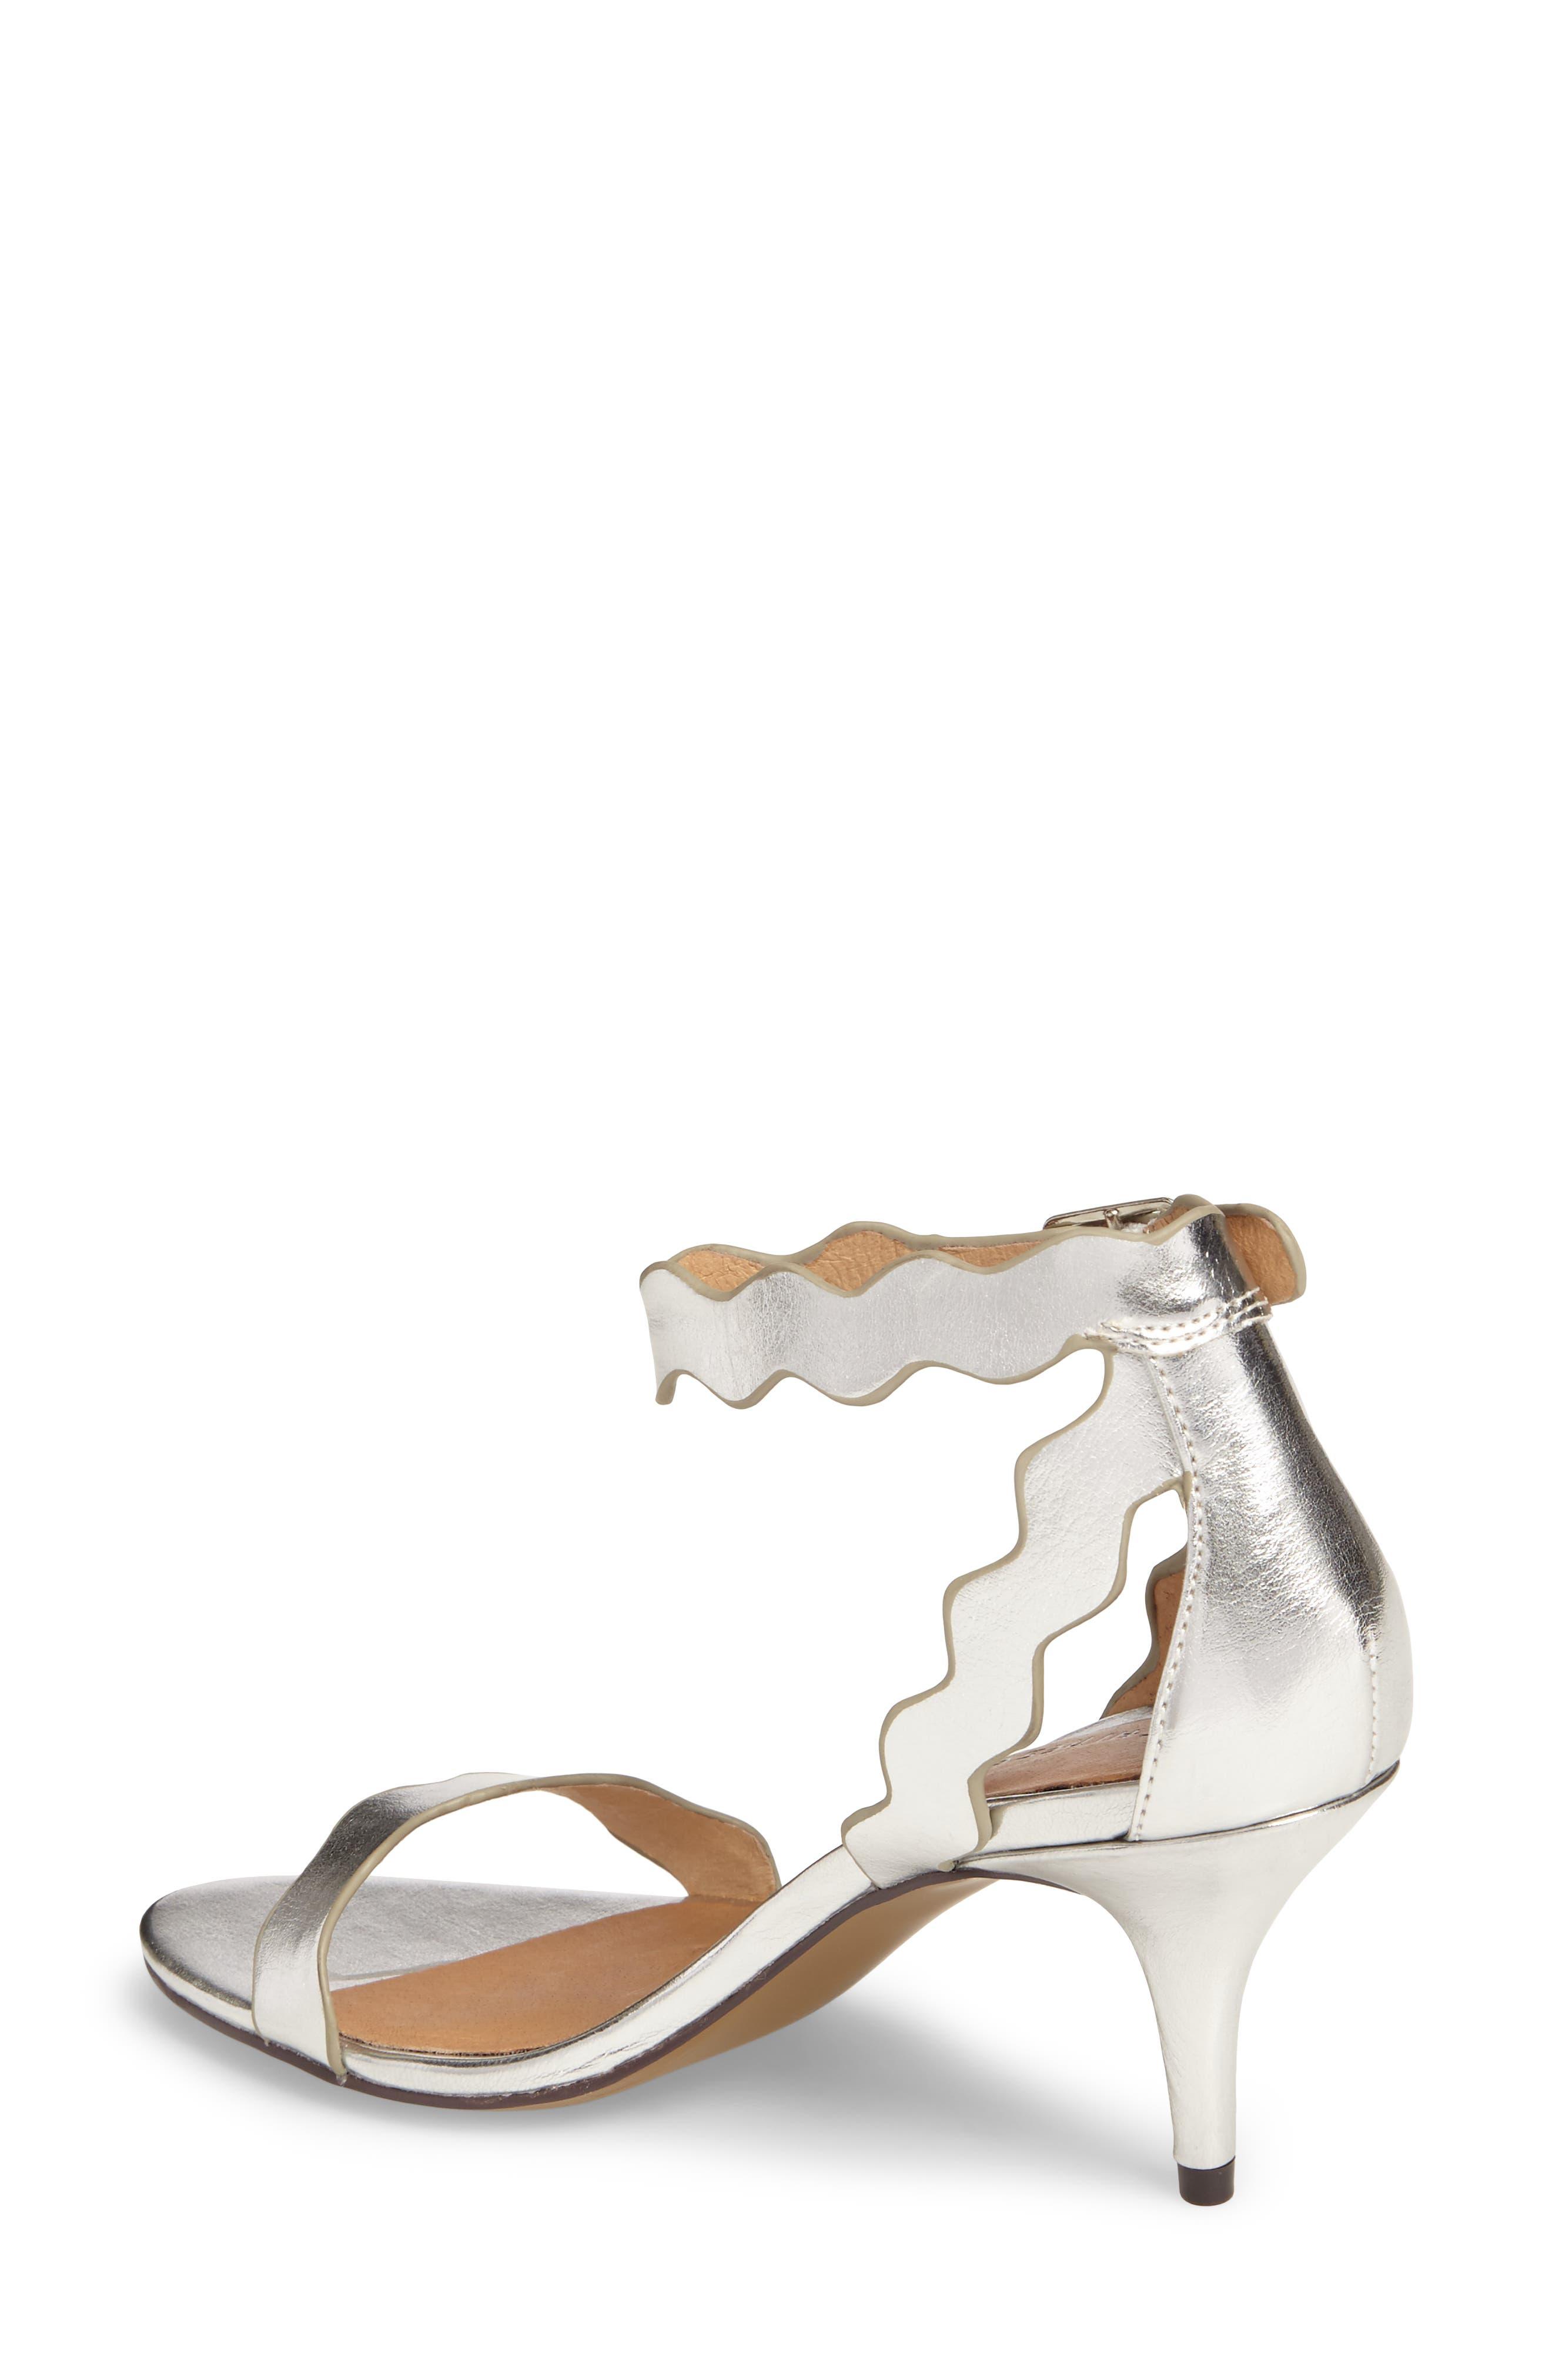 'Rubie' Scalloped Ankle Strap Sandal,                             Alternate thumbnail 2, color,                             040